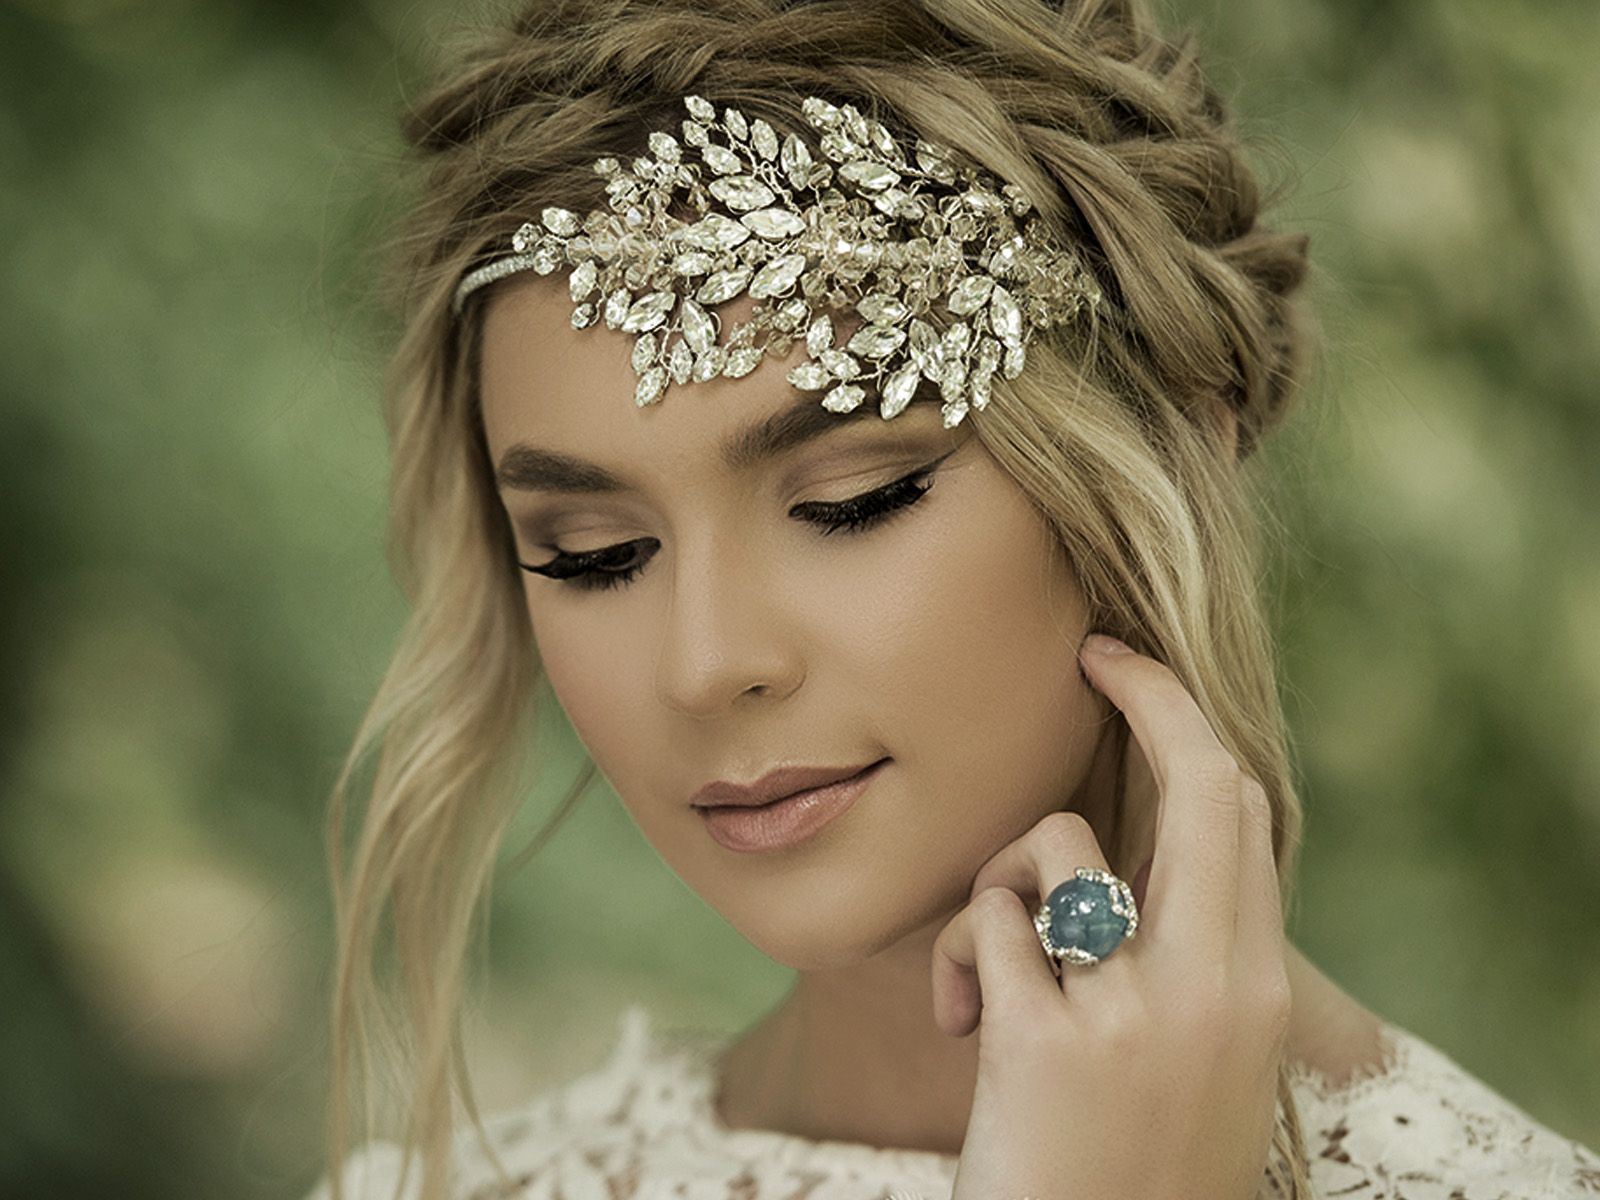 Exquisite honey crystal headpiece by Jo Barnes